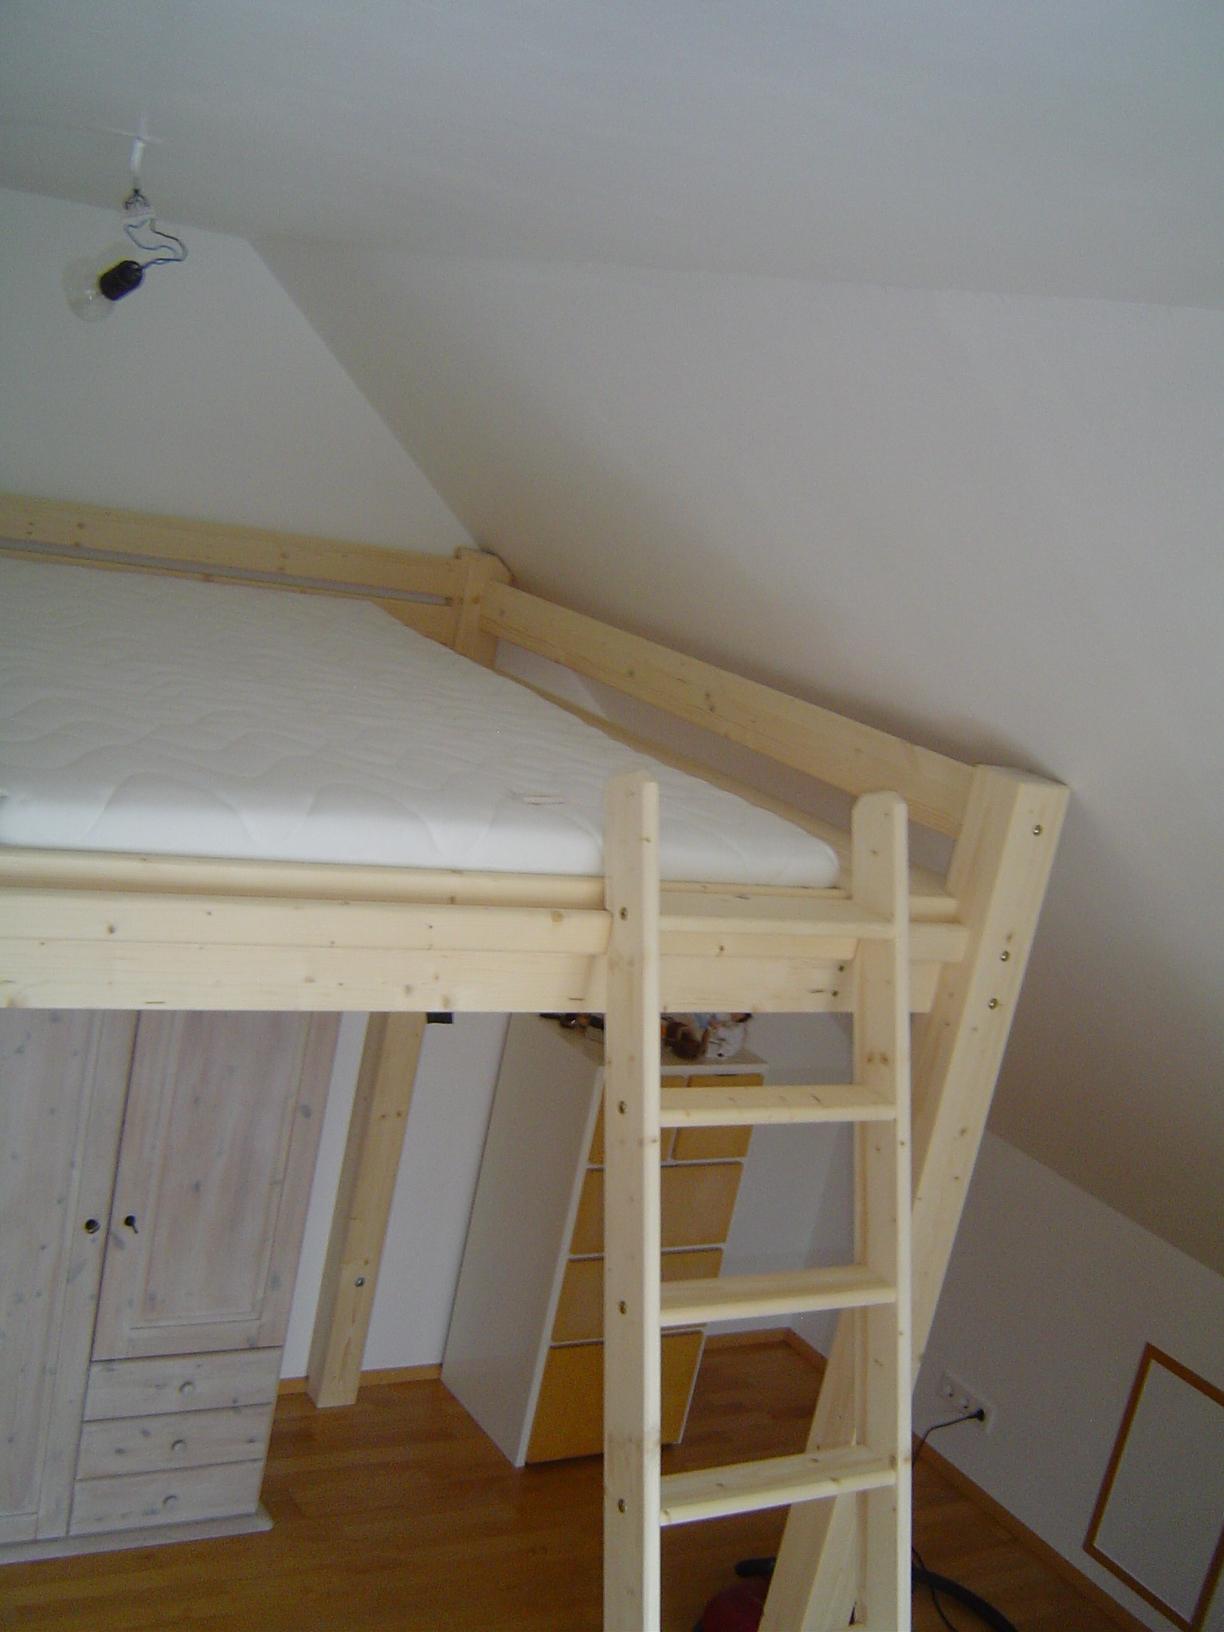 hauptseite rolands bauplaene. Black Bedroom Furniture Sets. Home Design Ideas